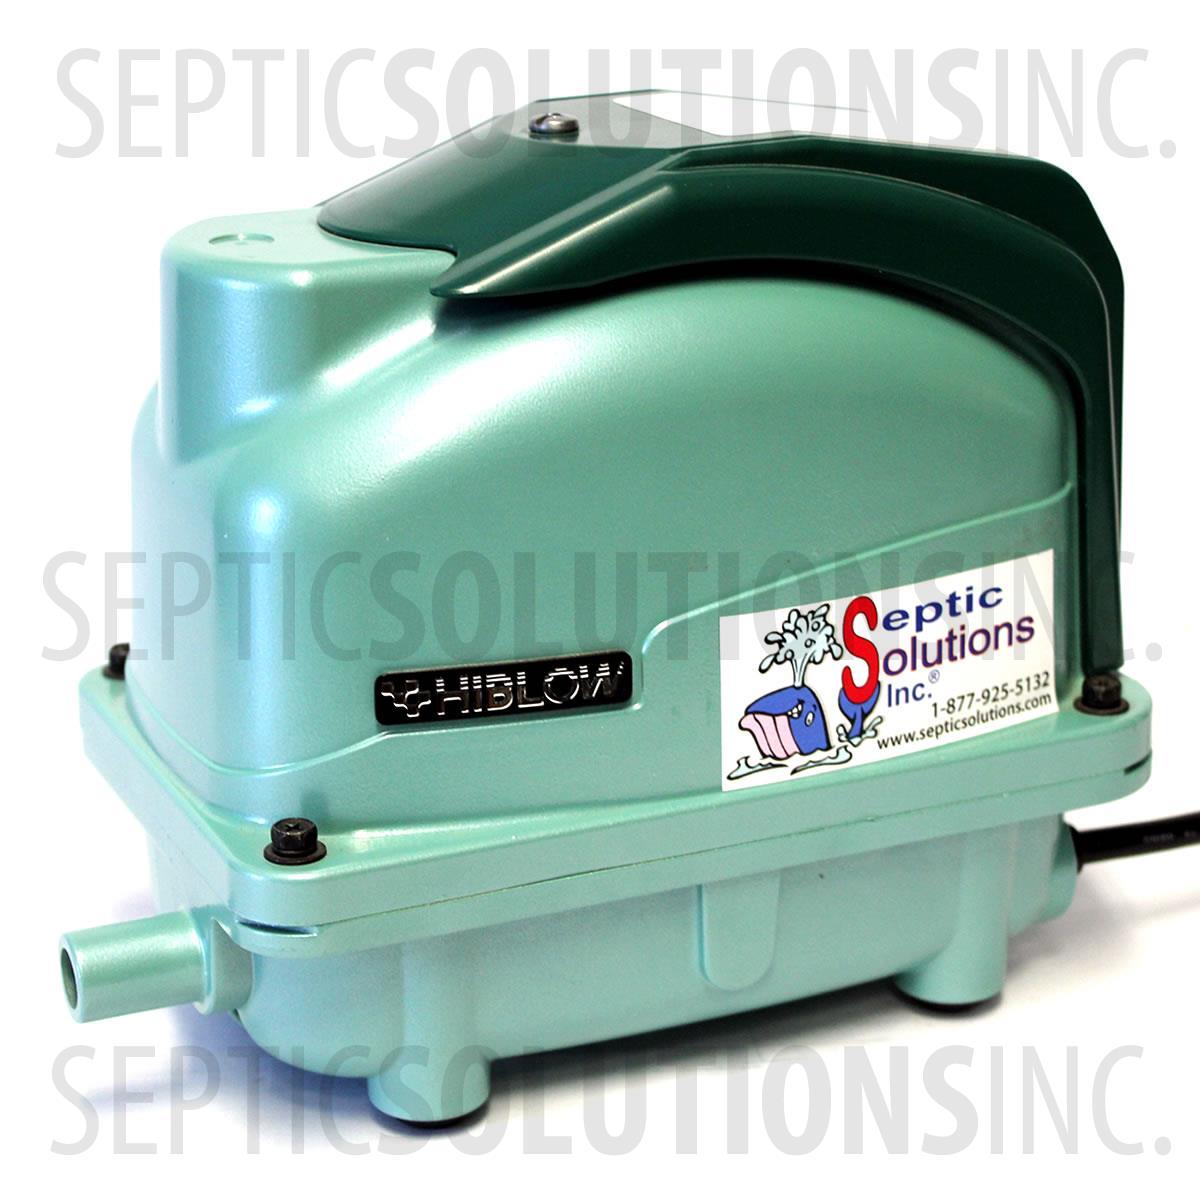 Hiblow Xp 80 Septic Aerator Pump Fast Amp Free Shipping